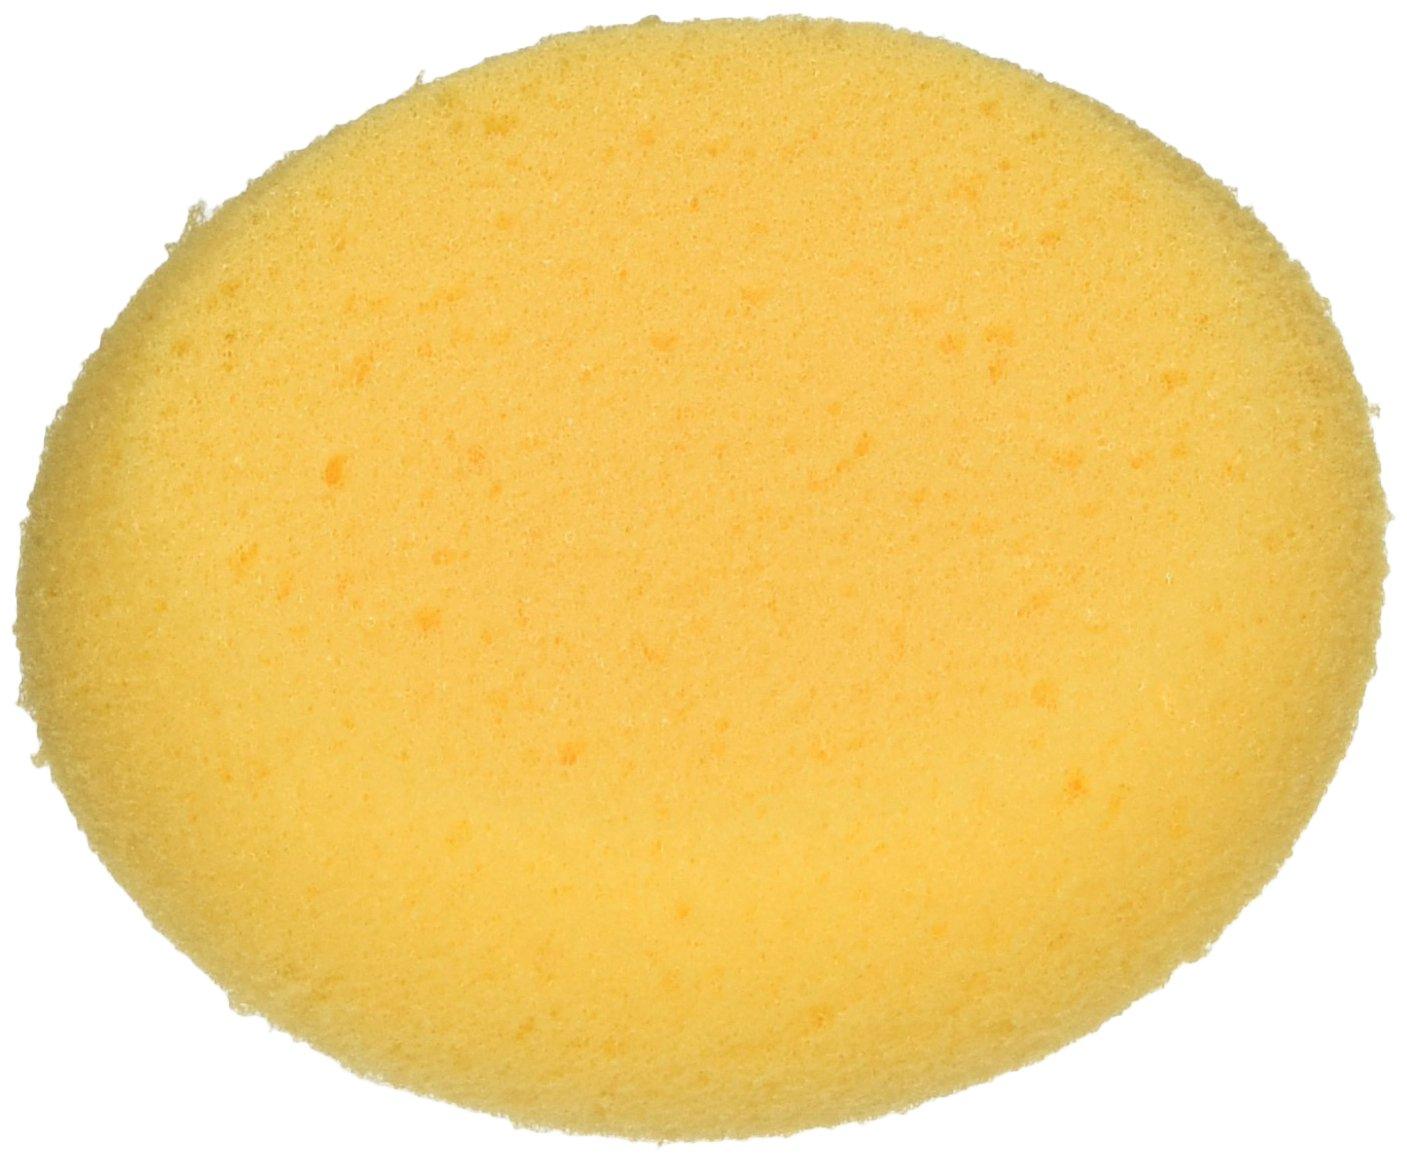 Royal Brush R2005-B Synthetic Ceramic Sponge, 2-1/2'' Diameter